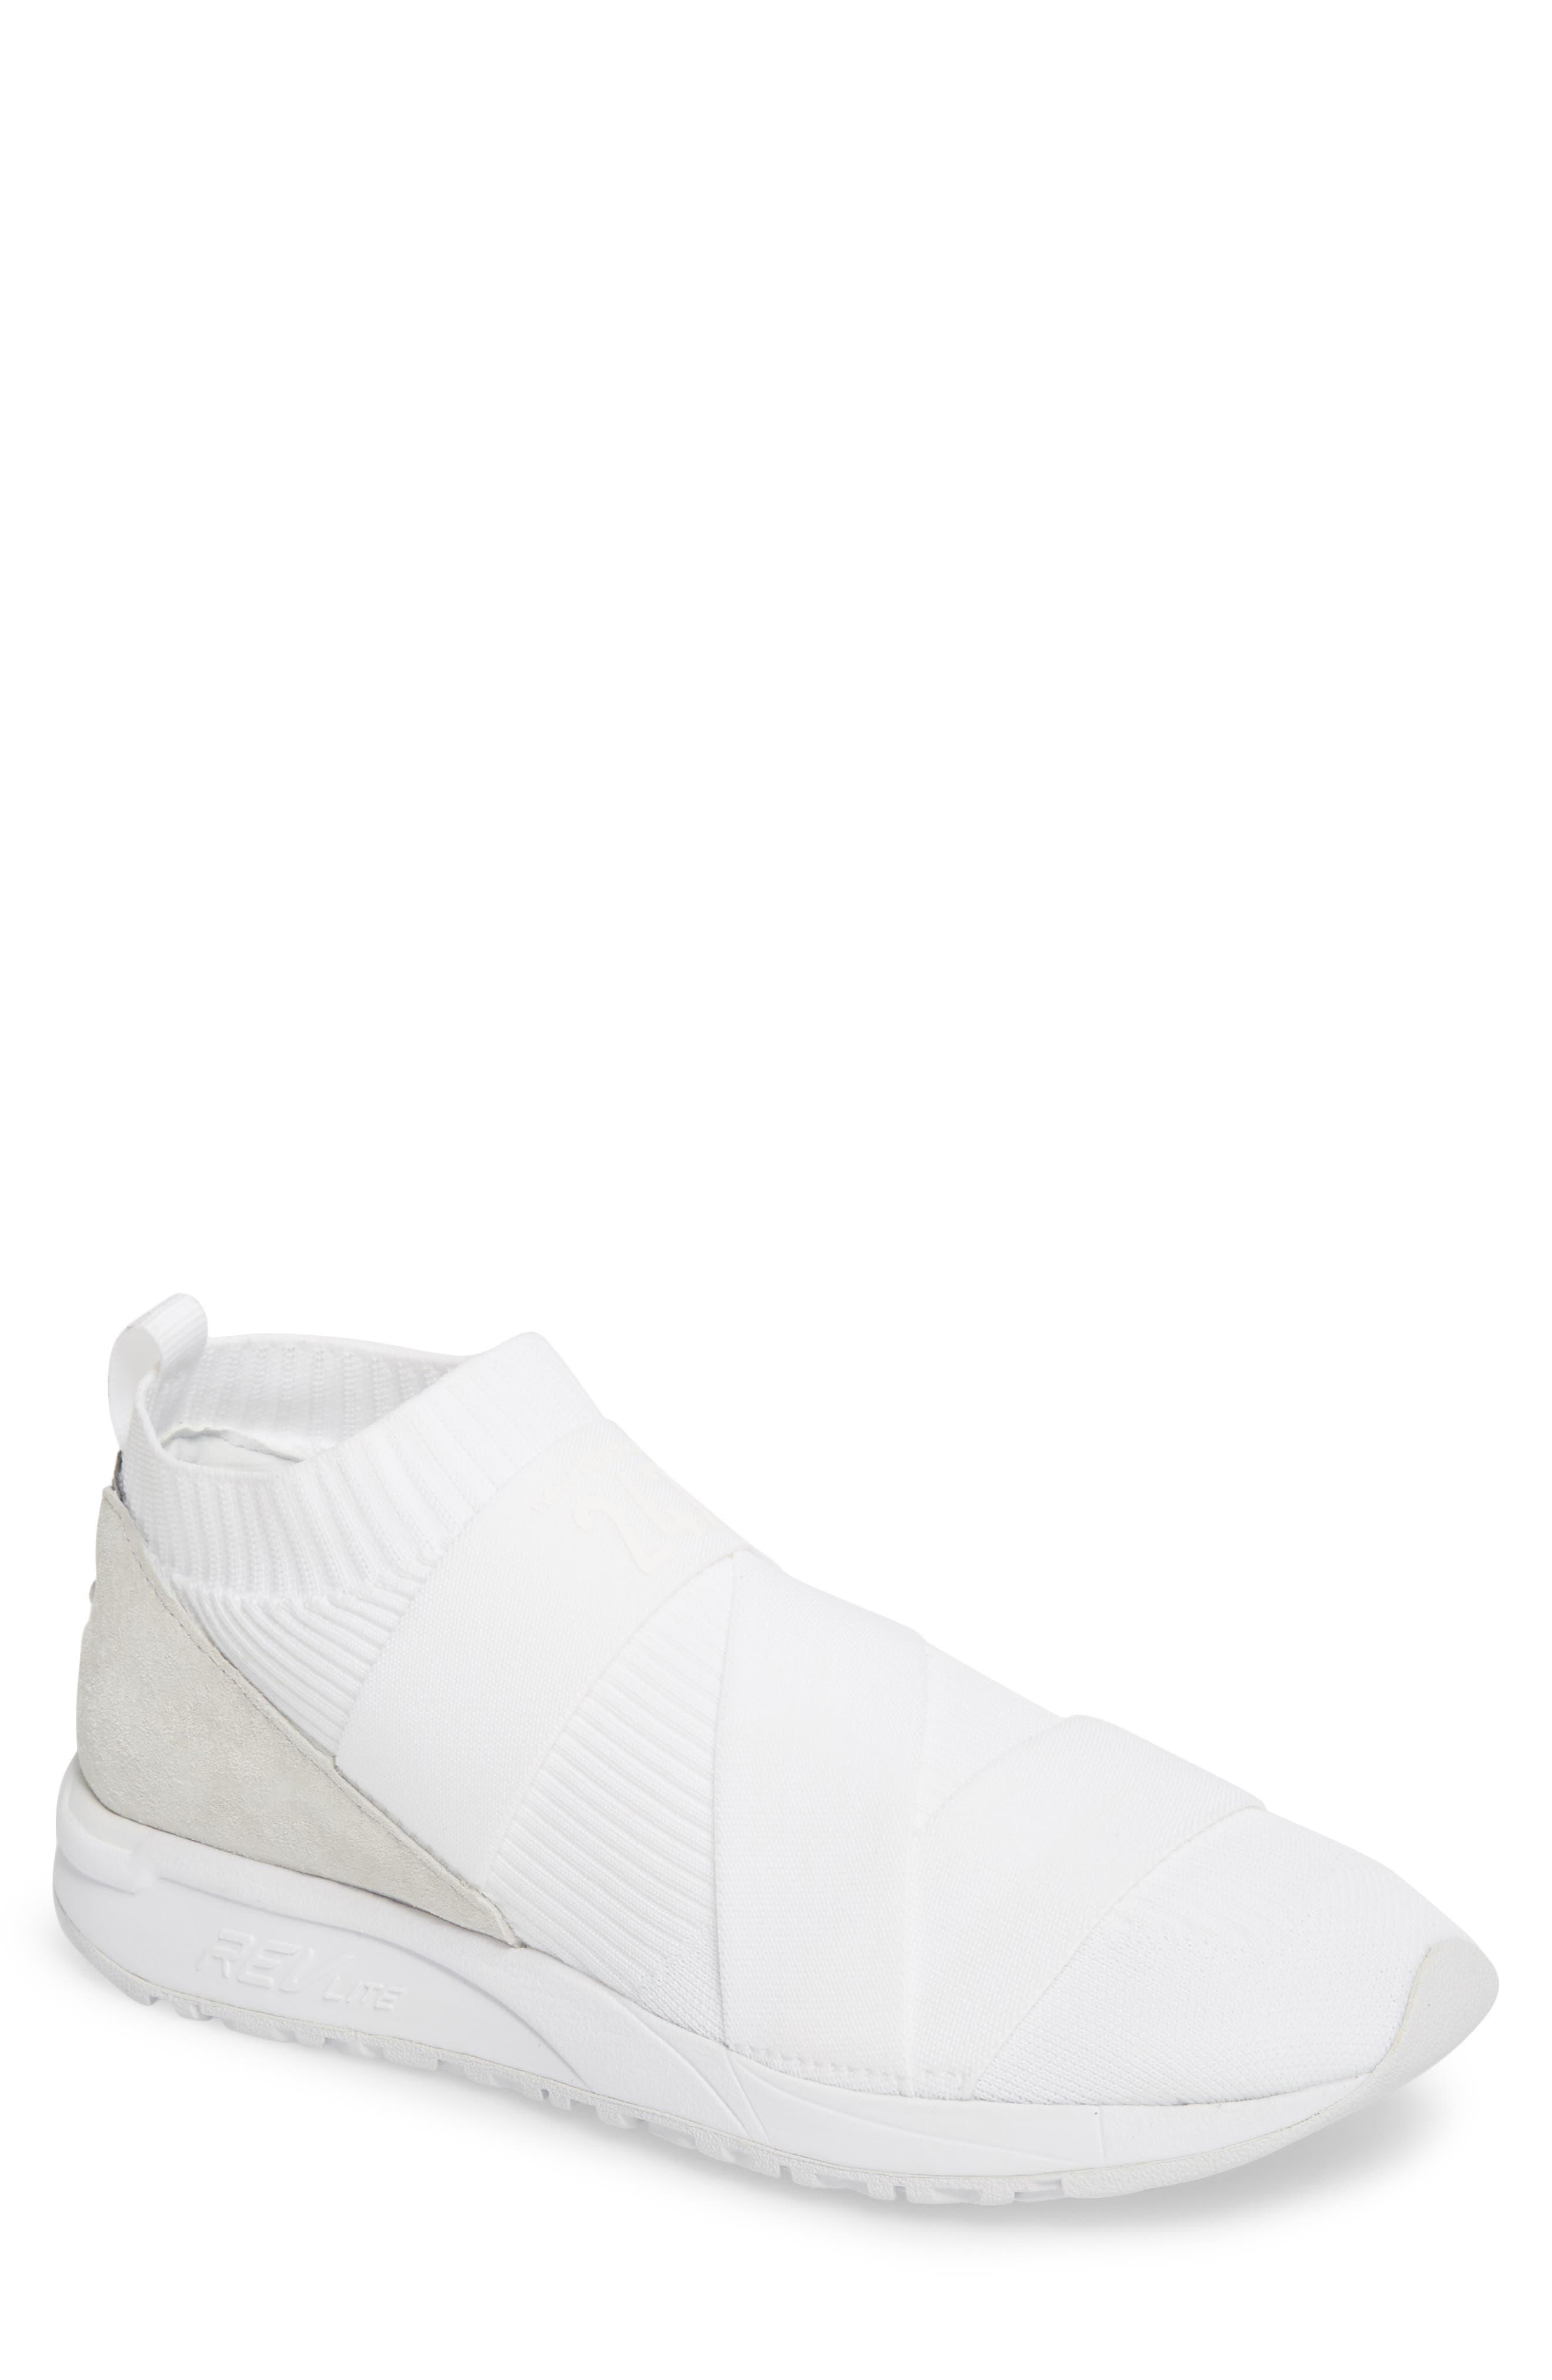 247 Knit Sneaker,                         Main,                         color, WHITE